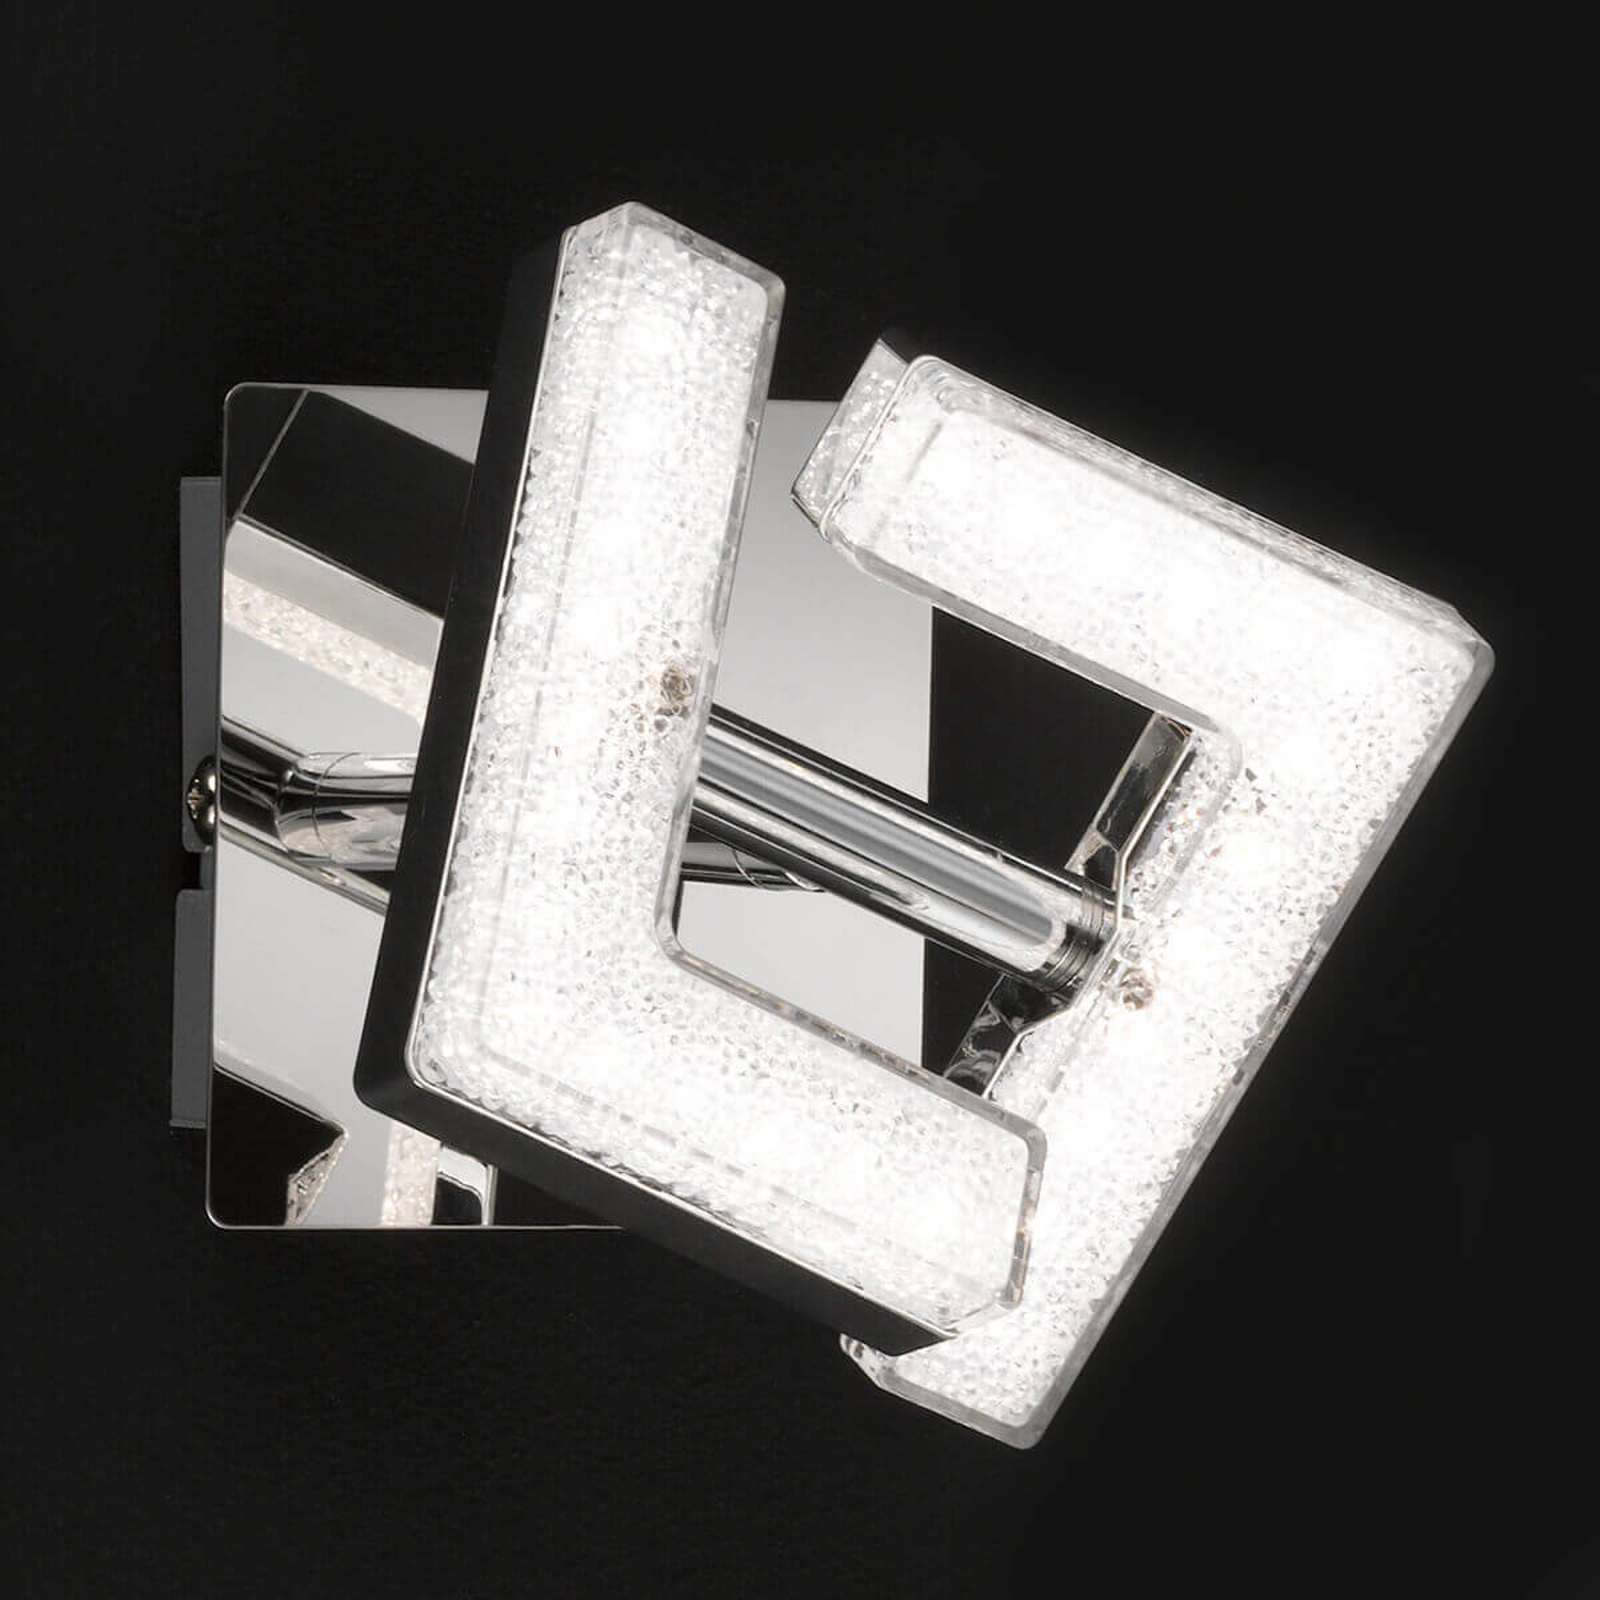 Chroomglanzende LED wandlamp Lea, instelbaar